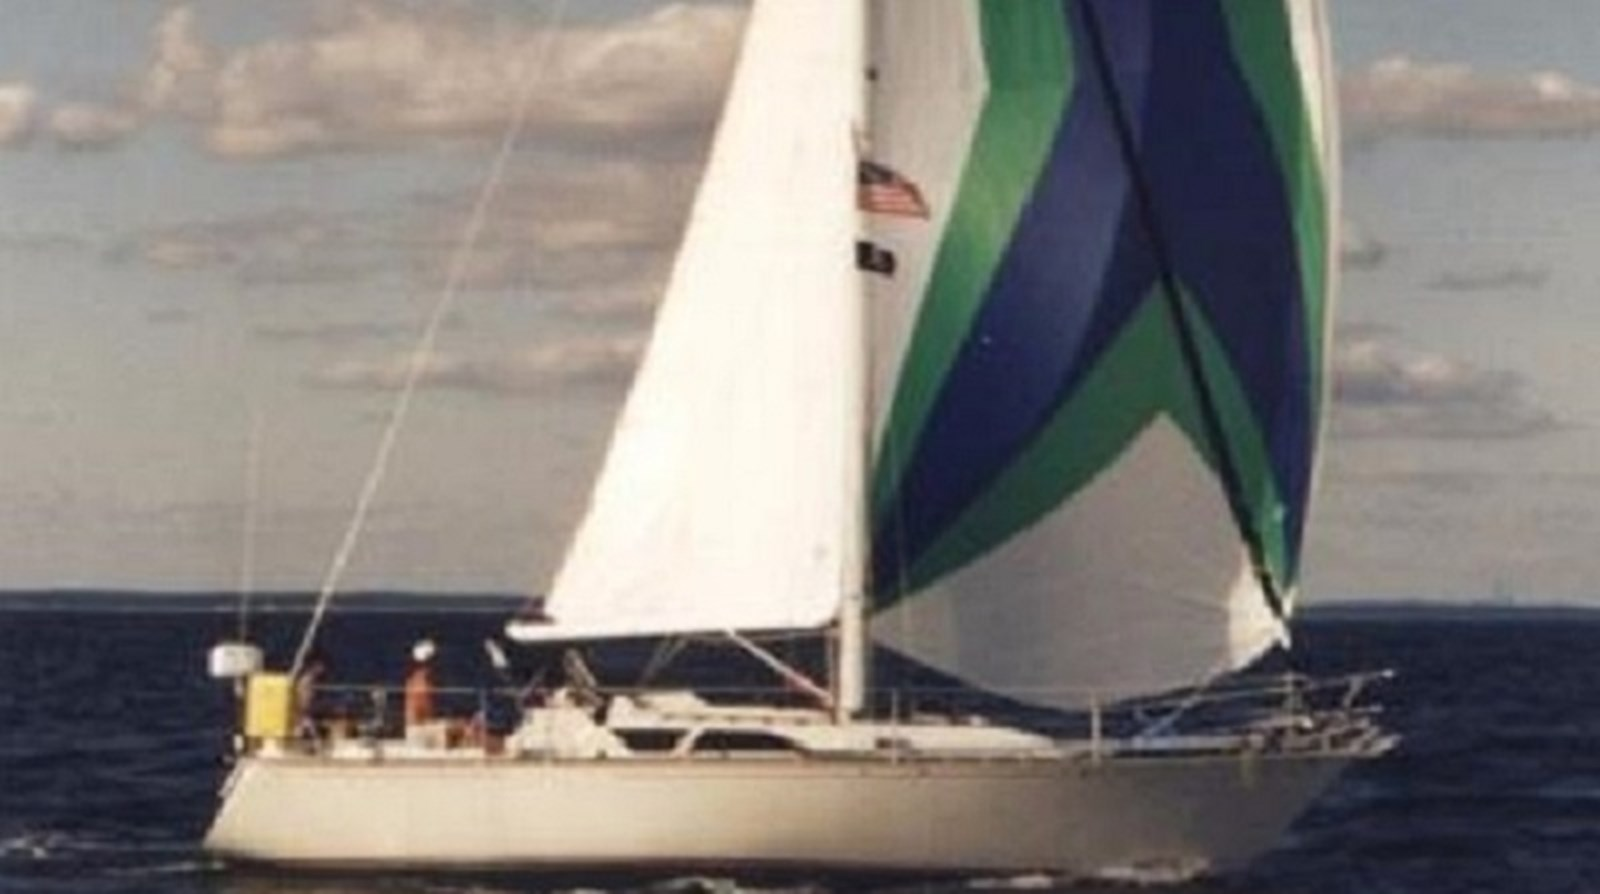 TAZ Sailing 1 1987 C & C Yachts Mark III Cruising Sailboat 2821879